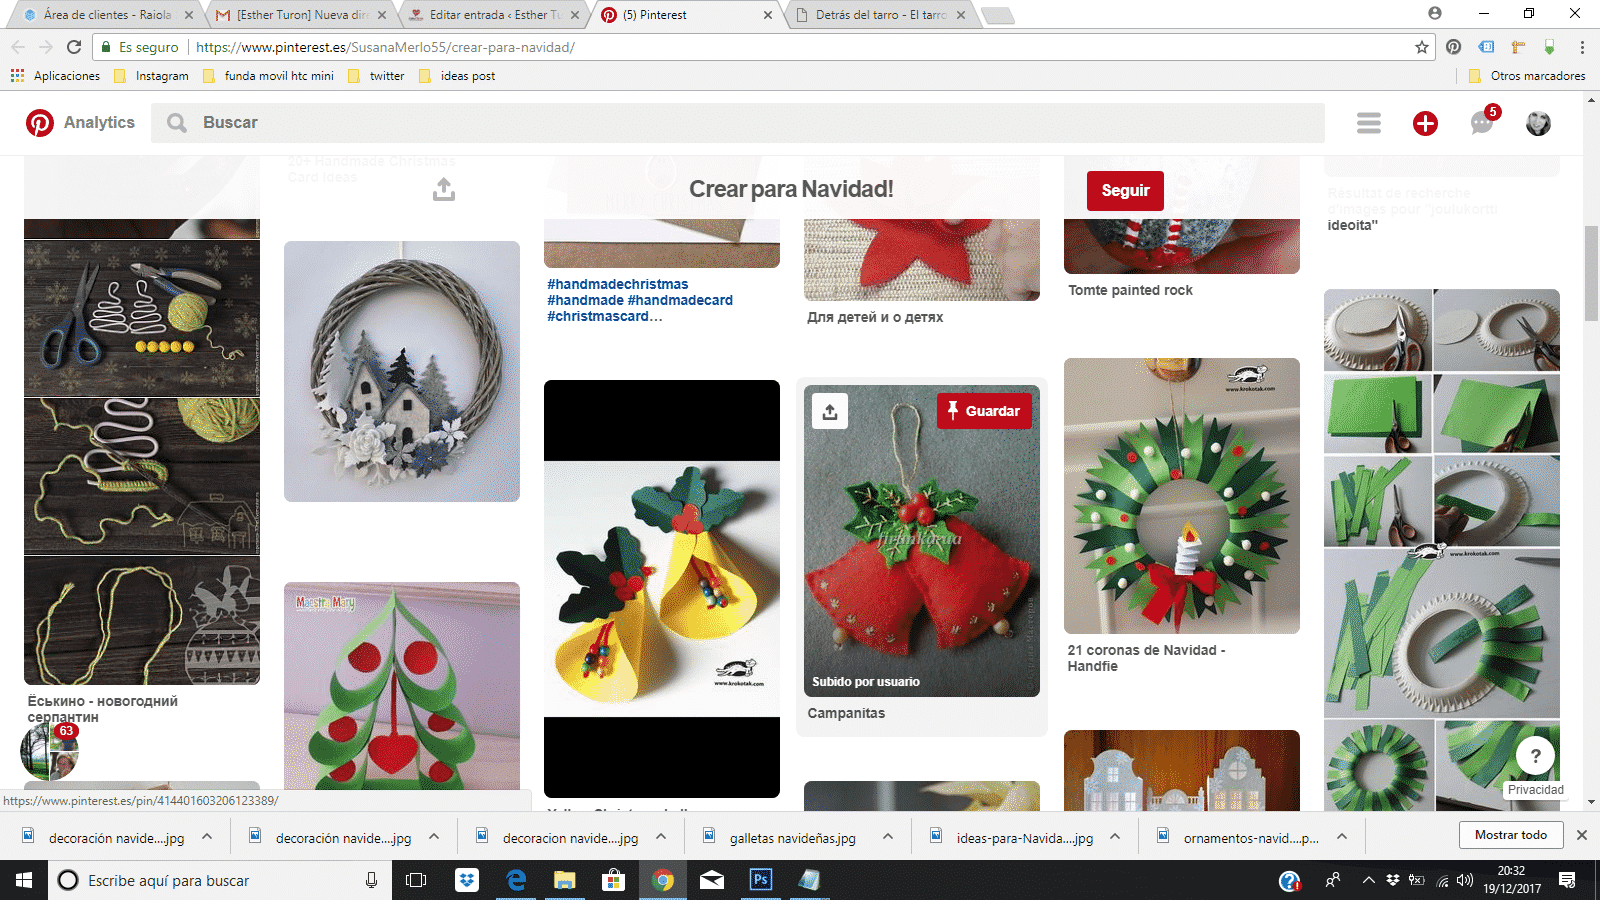 Crear para Navidad pinterest